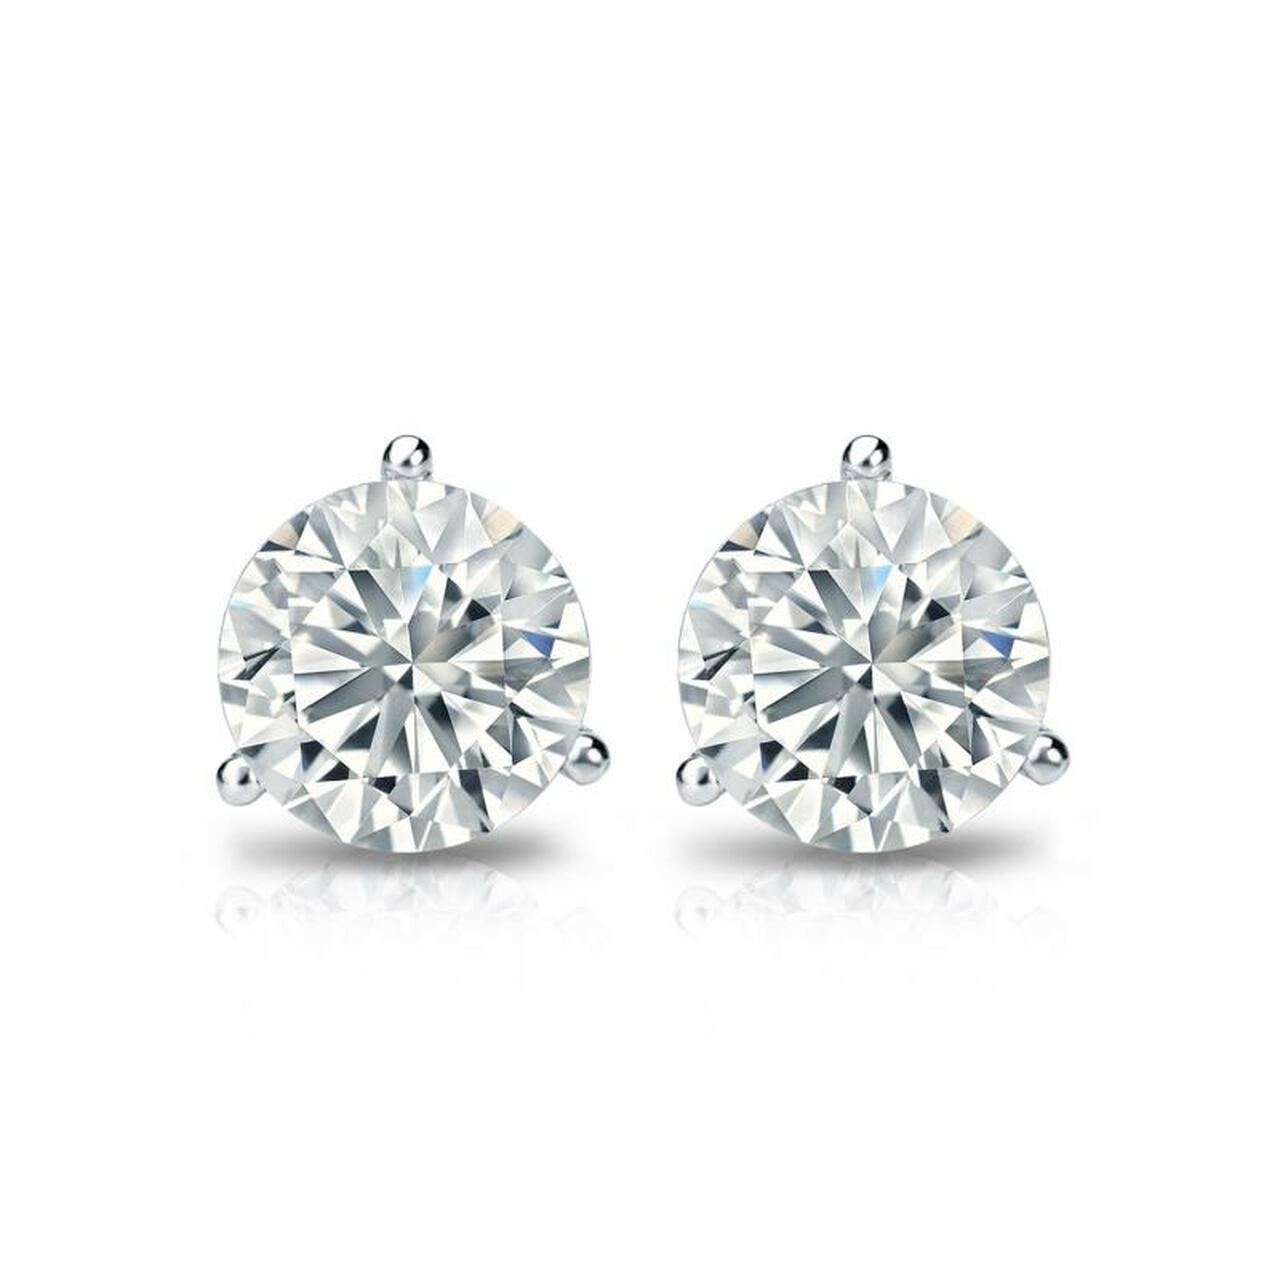 14K White Gold Martini Lab Grown Diamond Studs (0.75 TCW)